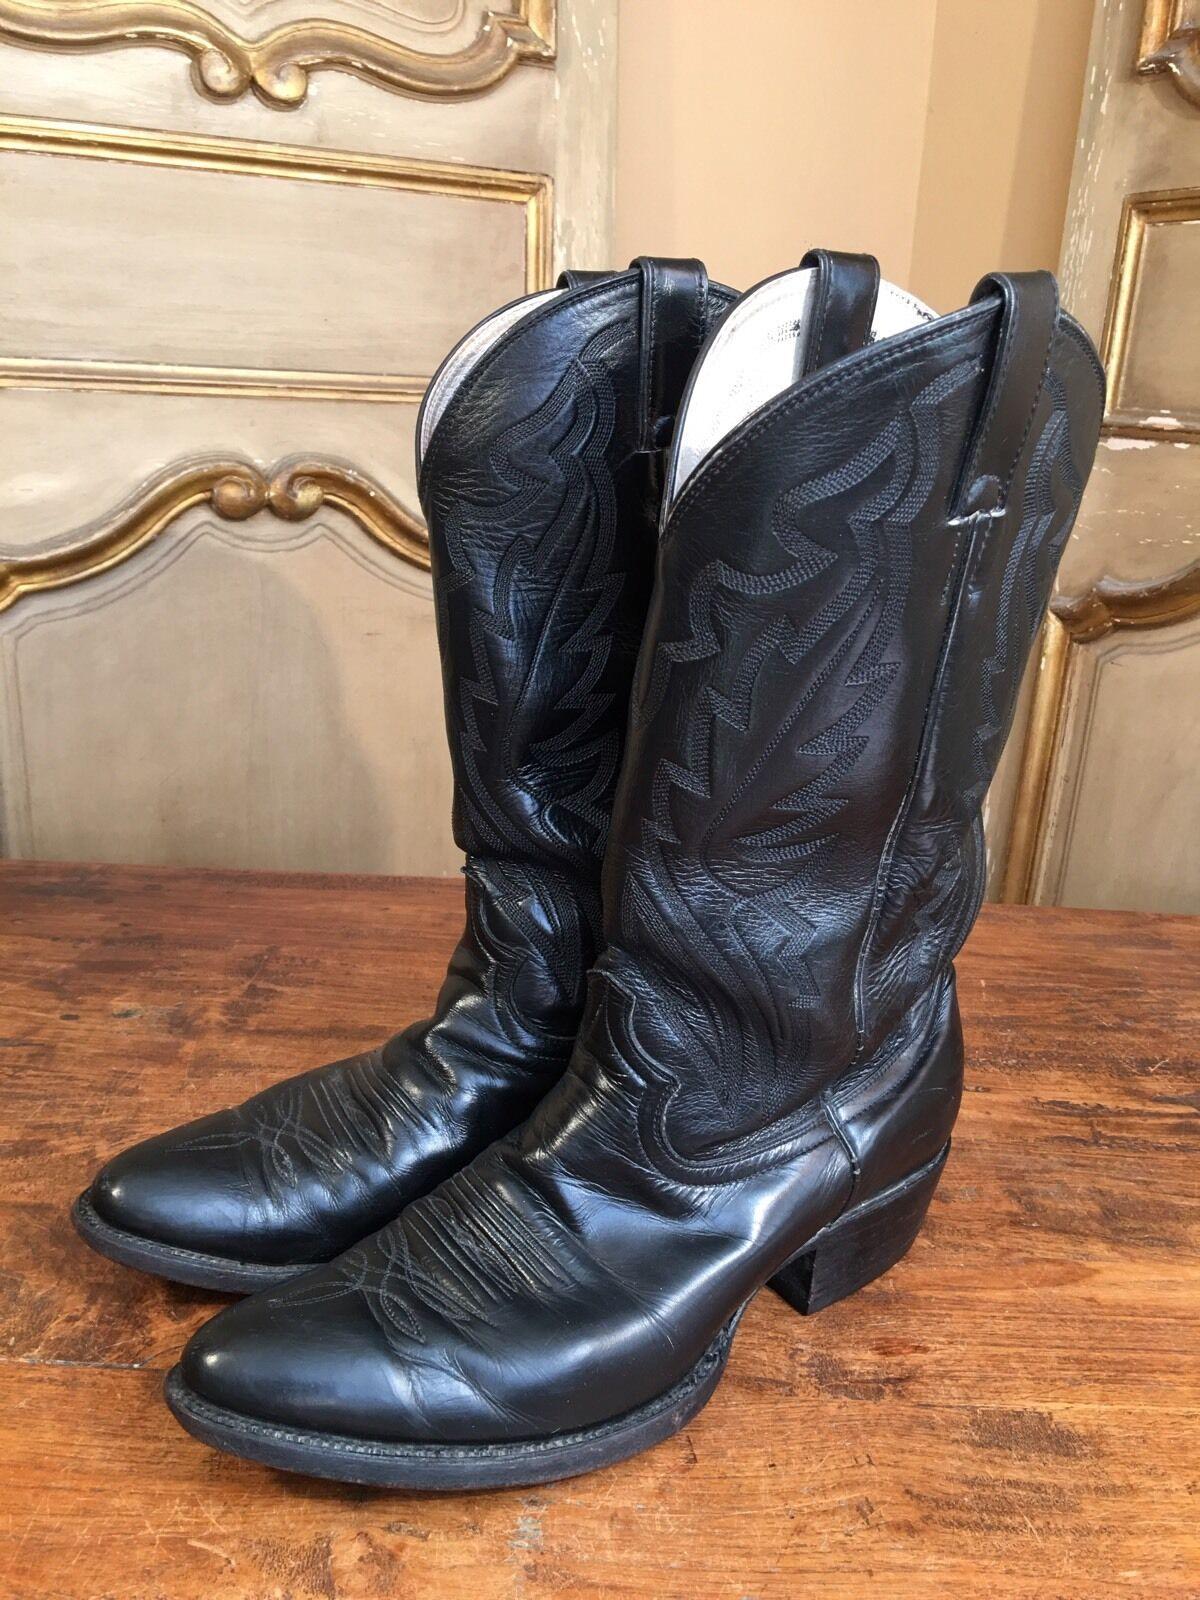 3995768931 VINTAGE DIAMOND J COWBOY WESTERN BOOTS 10 BROWN MEN'S D nrluug5100-new shoes